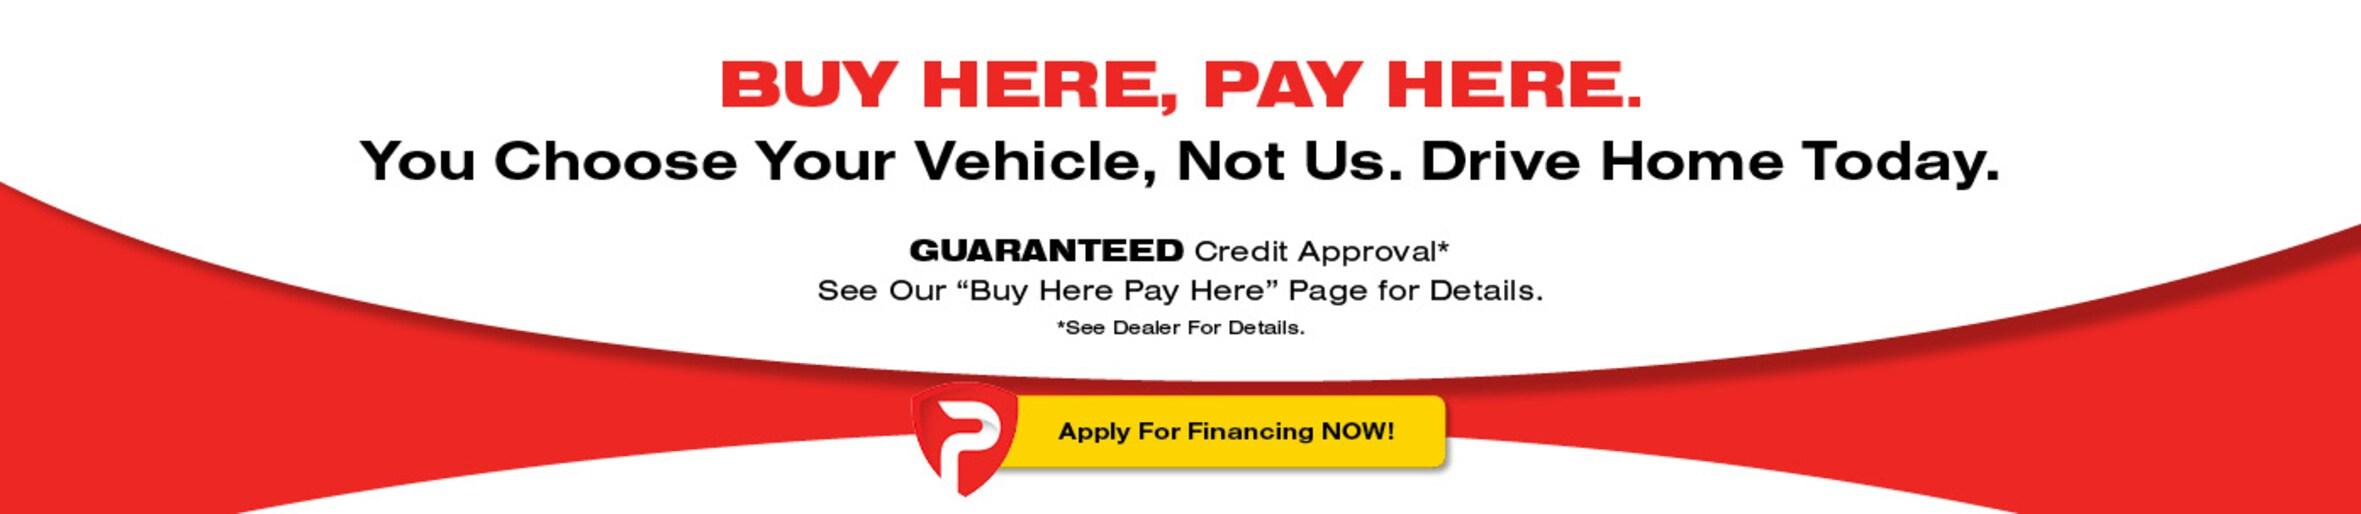 pre owned used car dealer in ri ma prestige auto mart. Black Bedroom Furniture Sets. Home Design Ideas